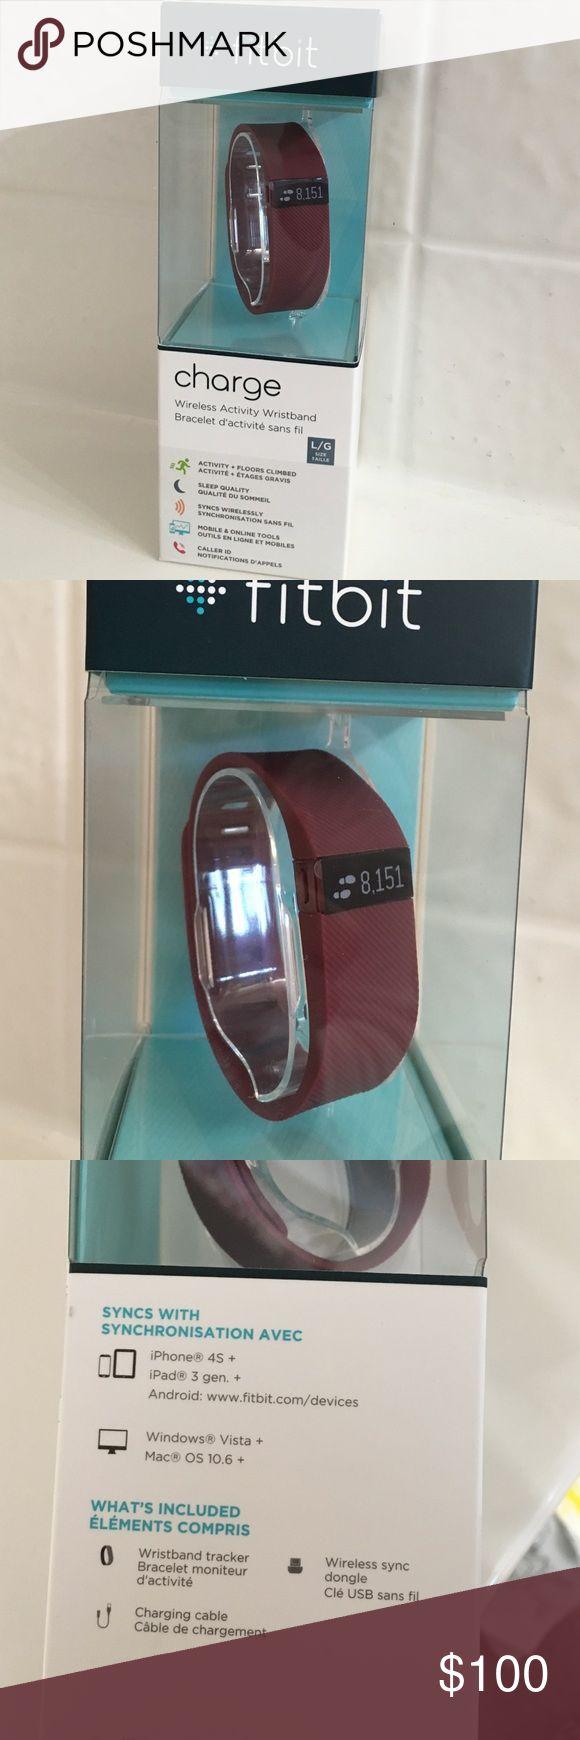 Fitbit A new Fitbit. Wireless Activity Wristband Bracelet d'activite sand fil Fitbit Jewelry Bracelets